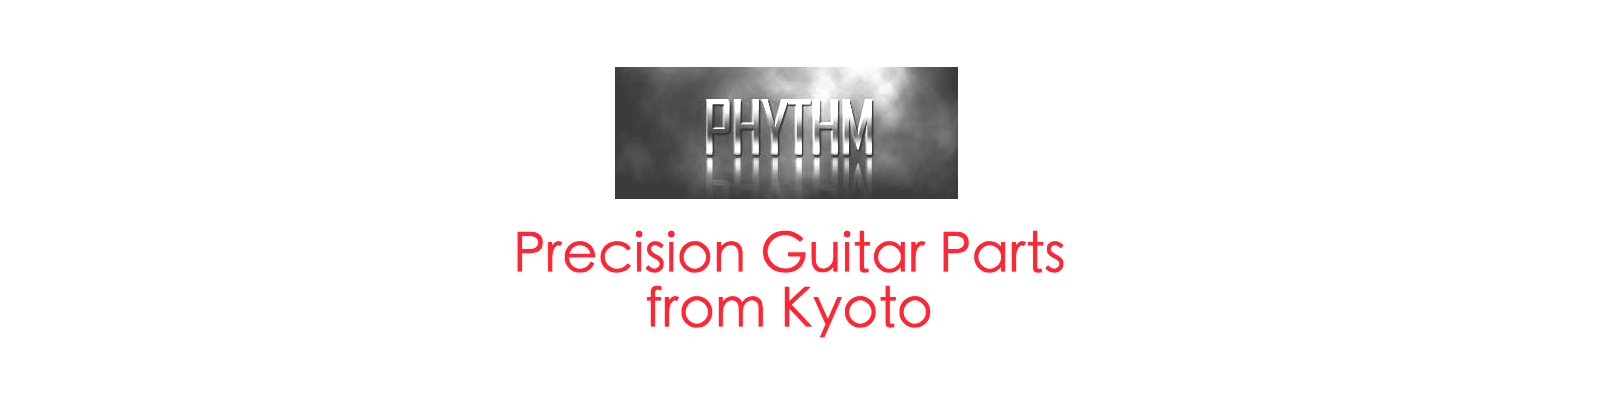 phythm-1600x400.jpg